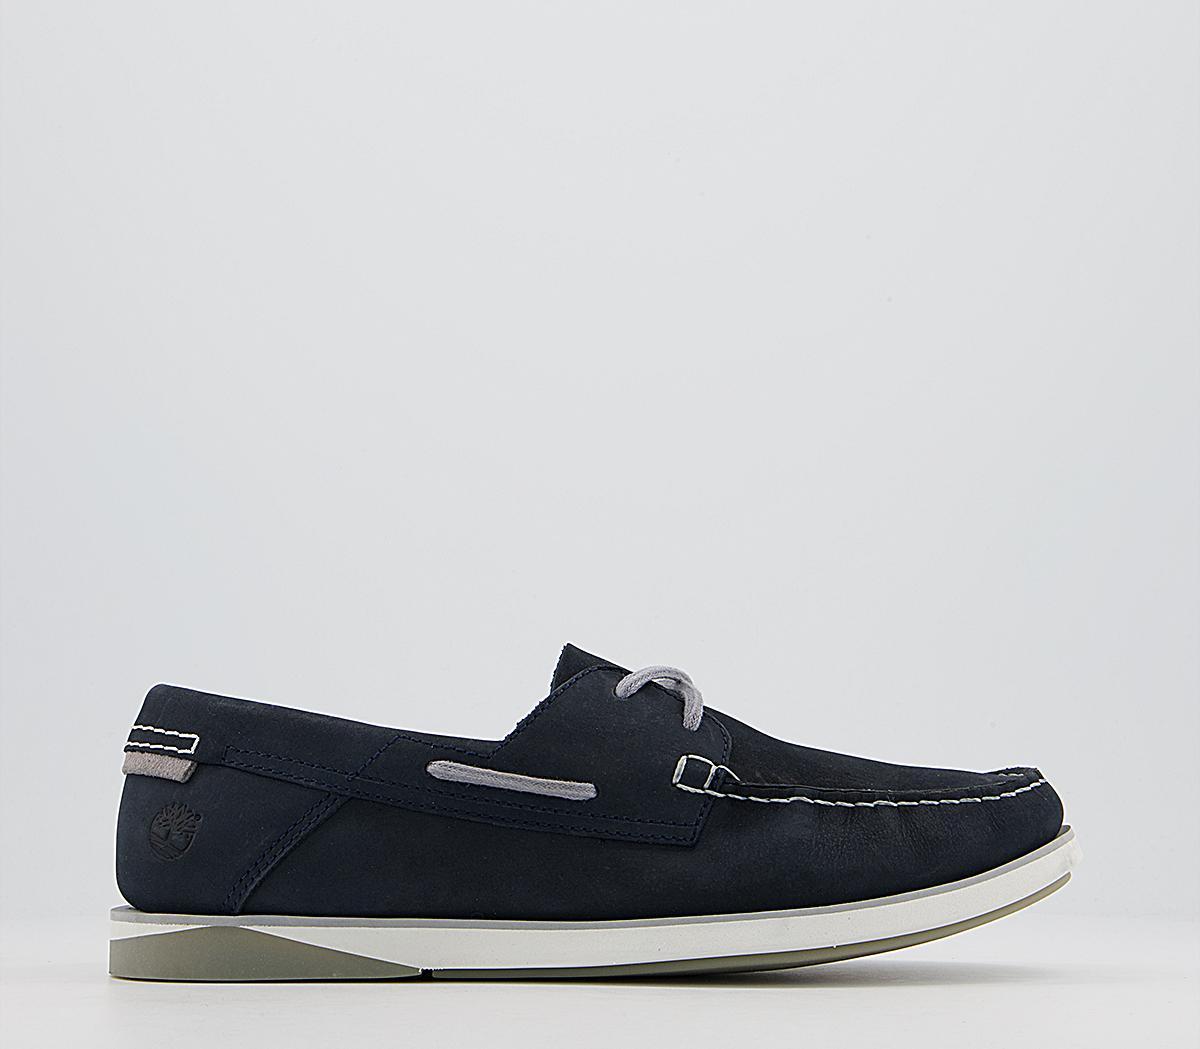 Atlantis Break Boat Shoes